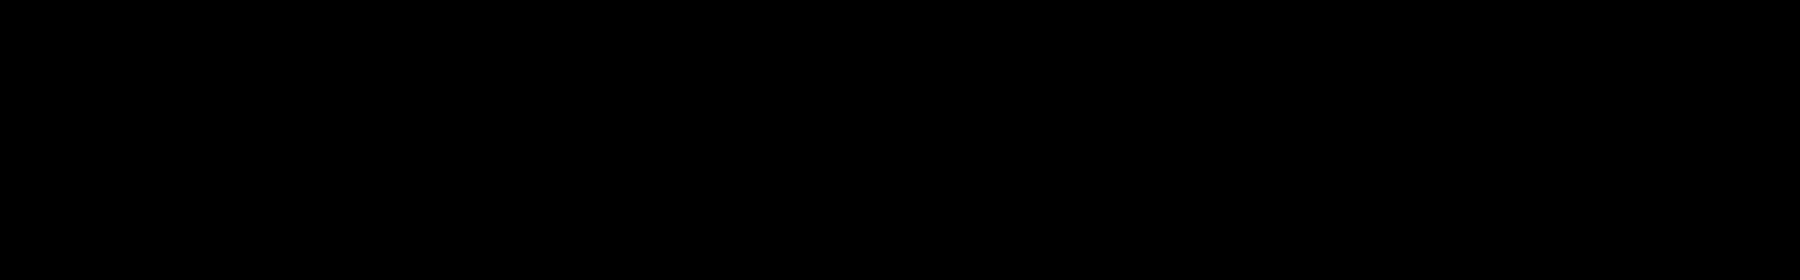 Techno Parallel audio waveform